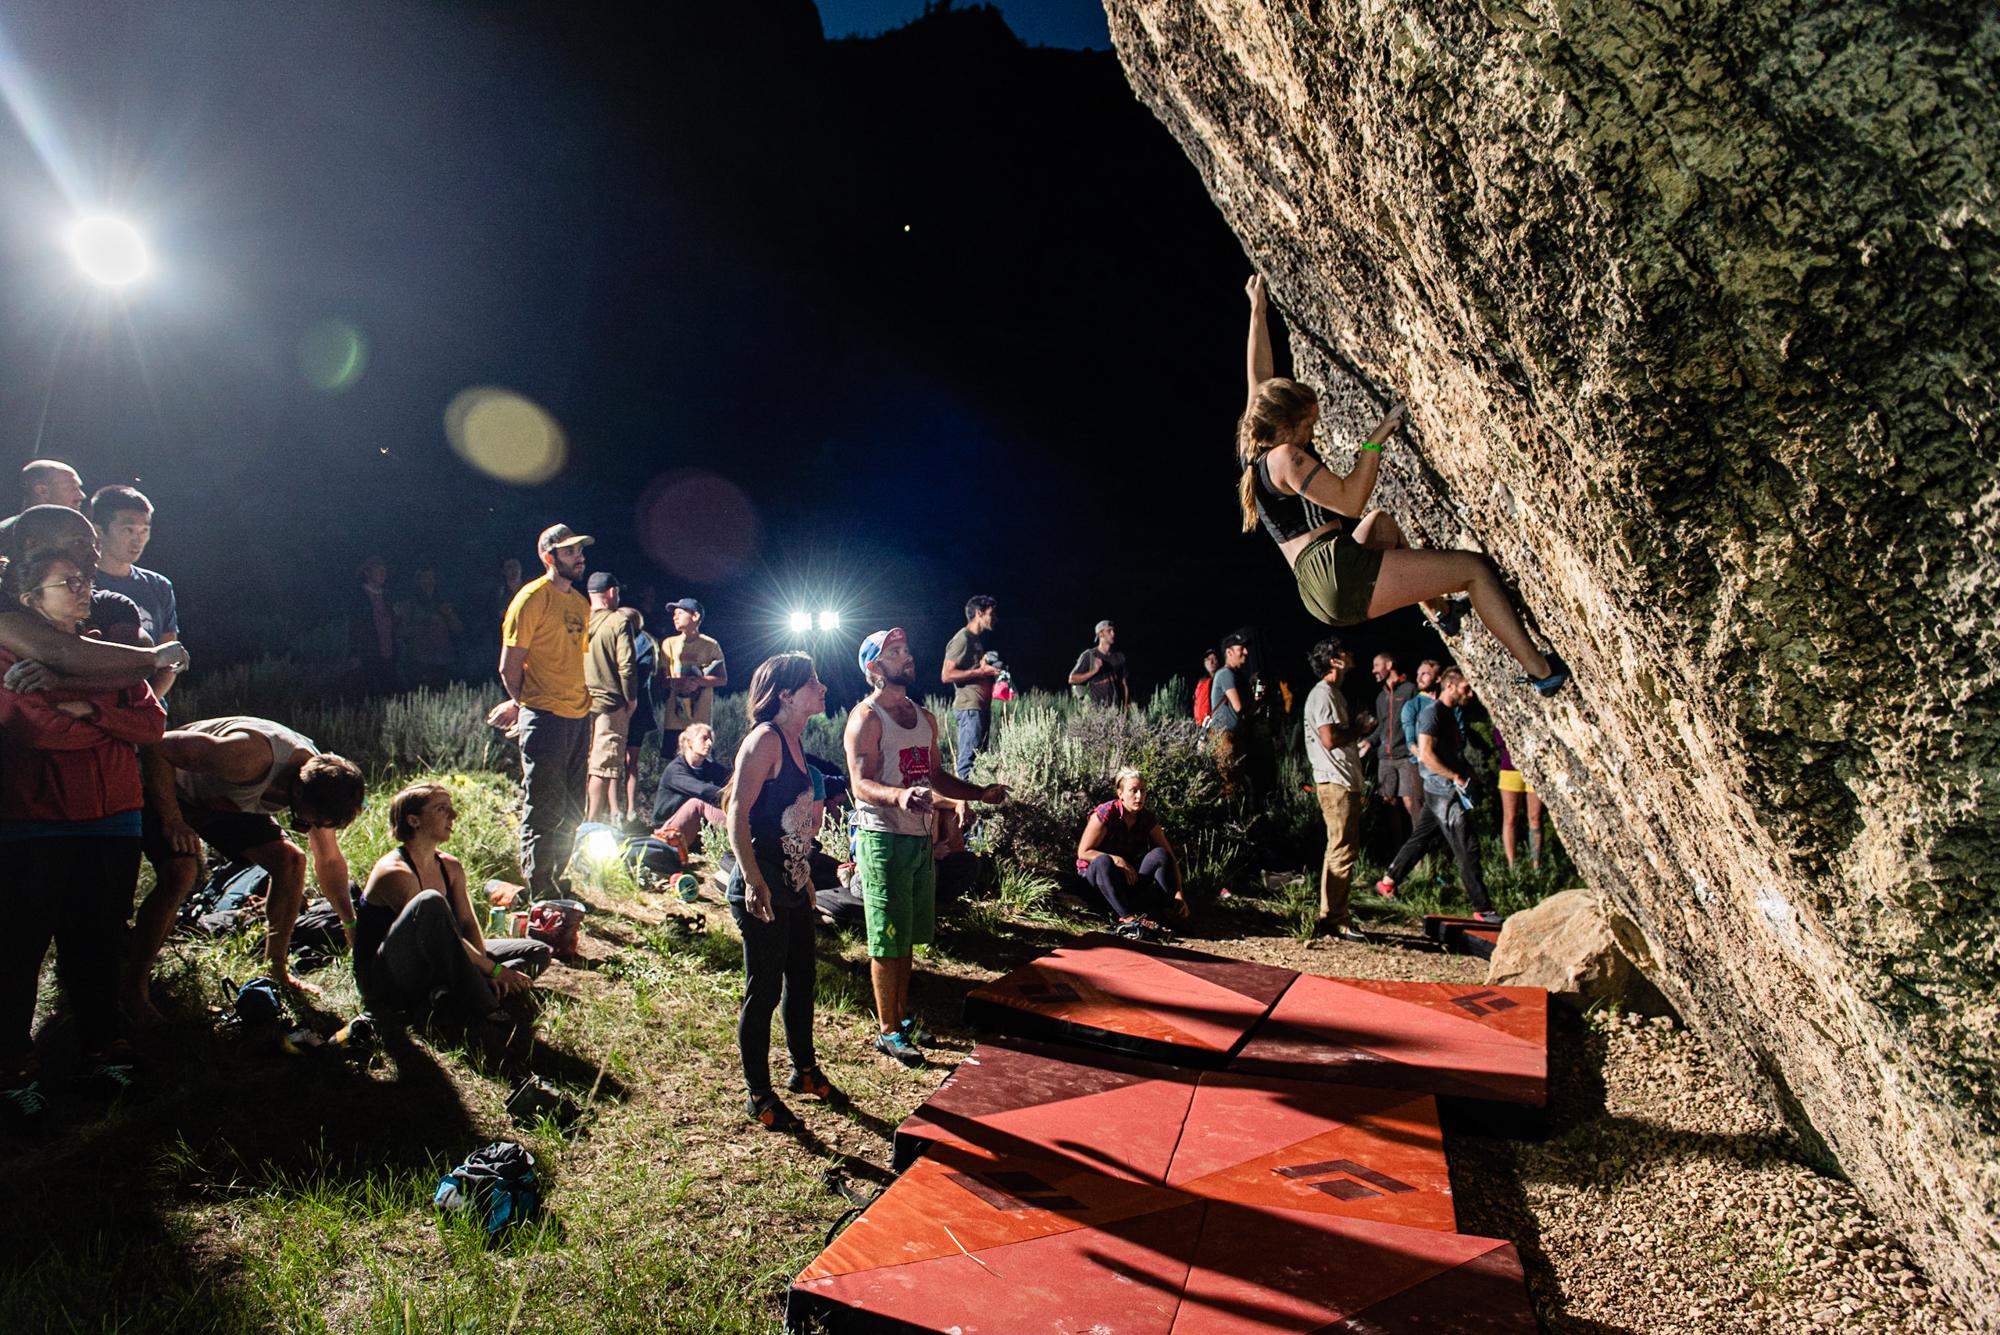 2019 International Climber Festival